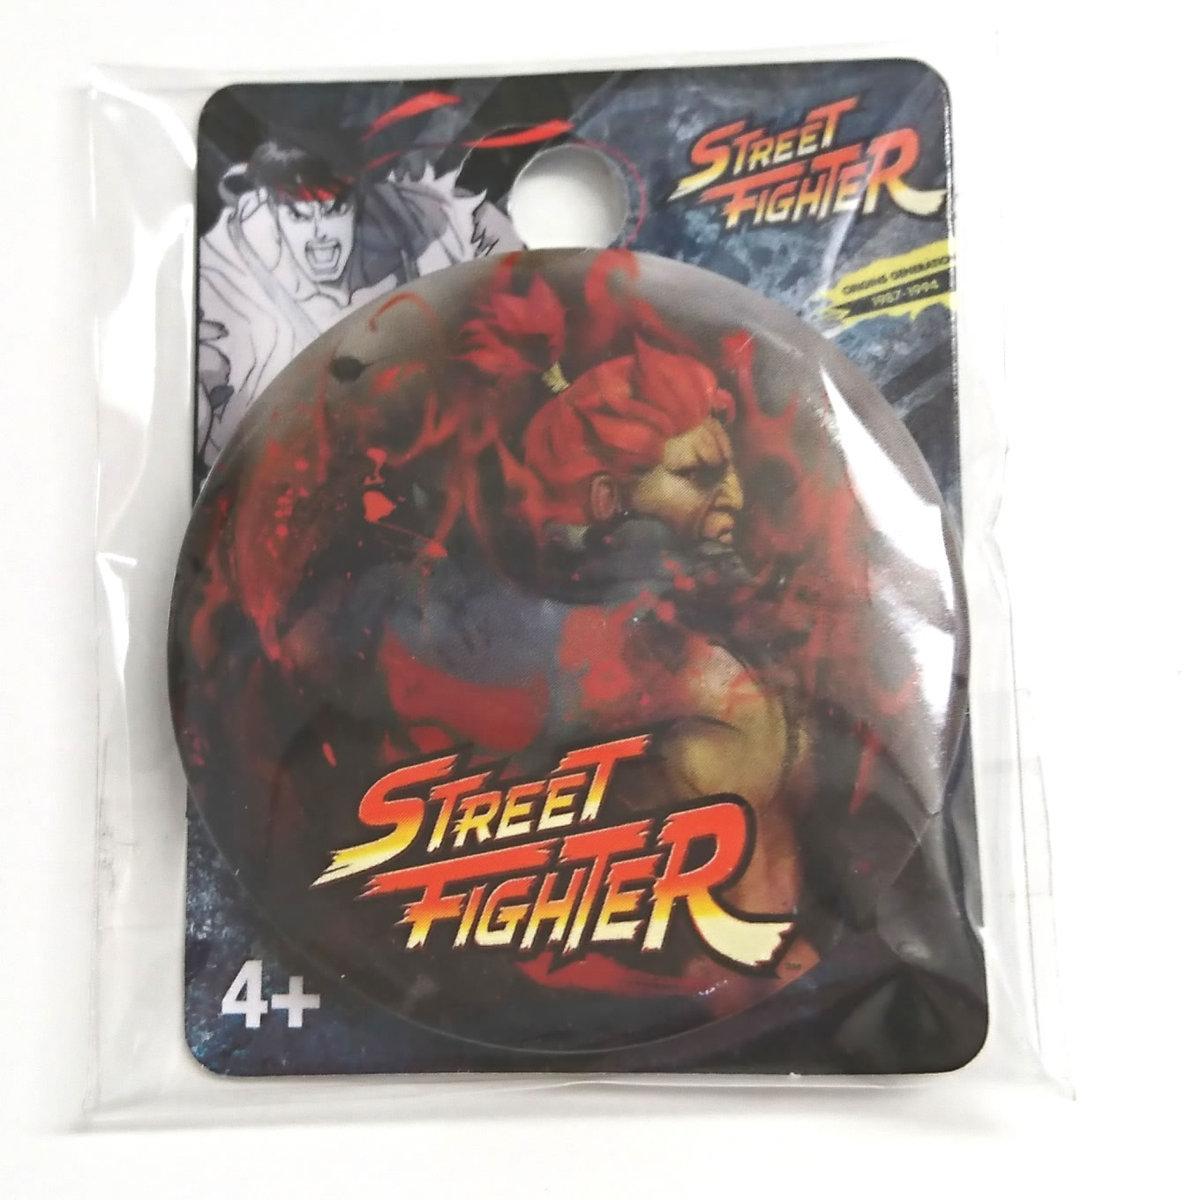 Street Fighter (ストリートファイター) Akuma (アクマ) Single Button Pin 缶バッジ _画像1